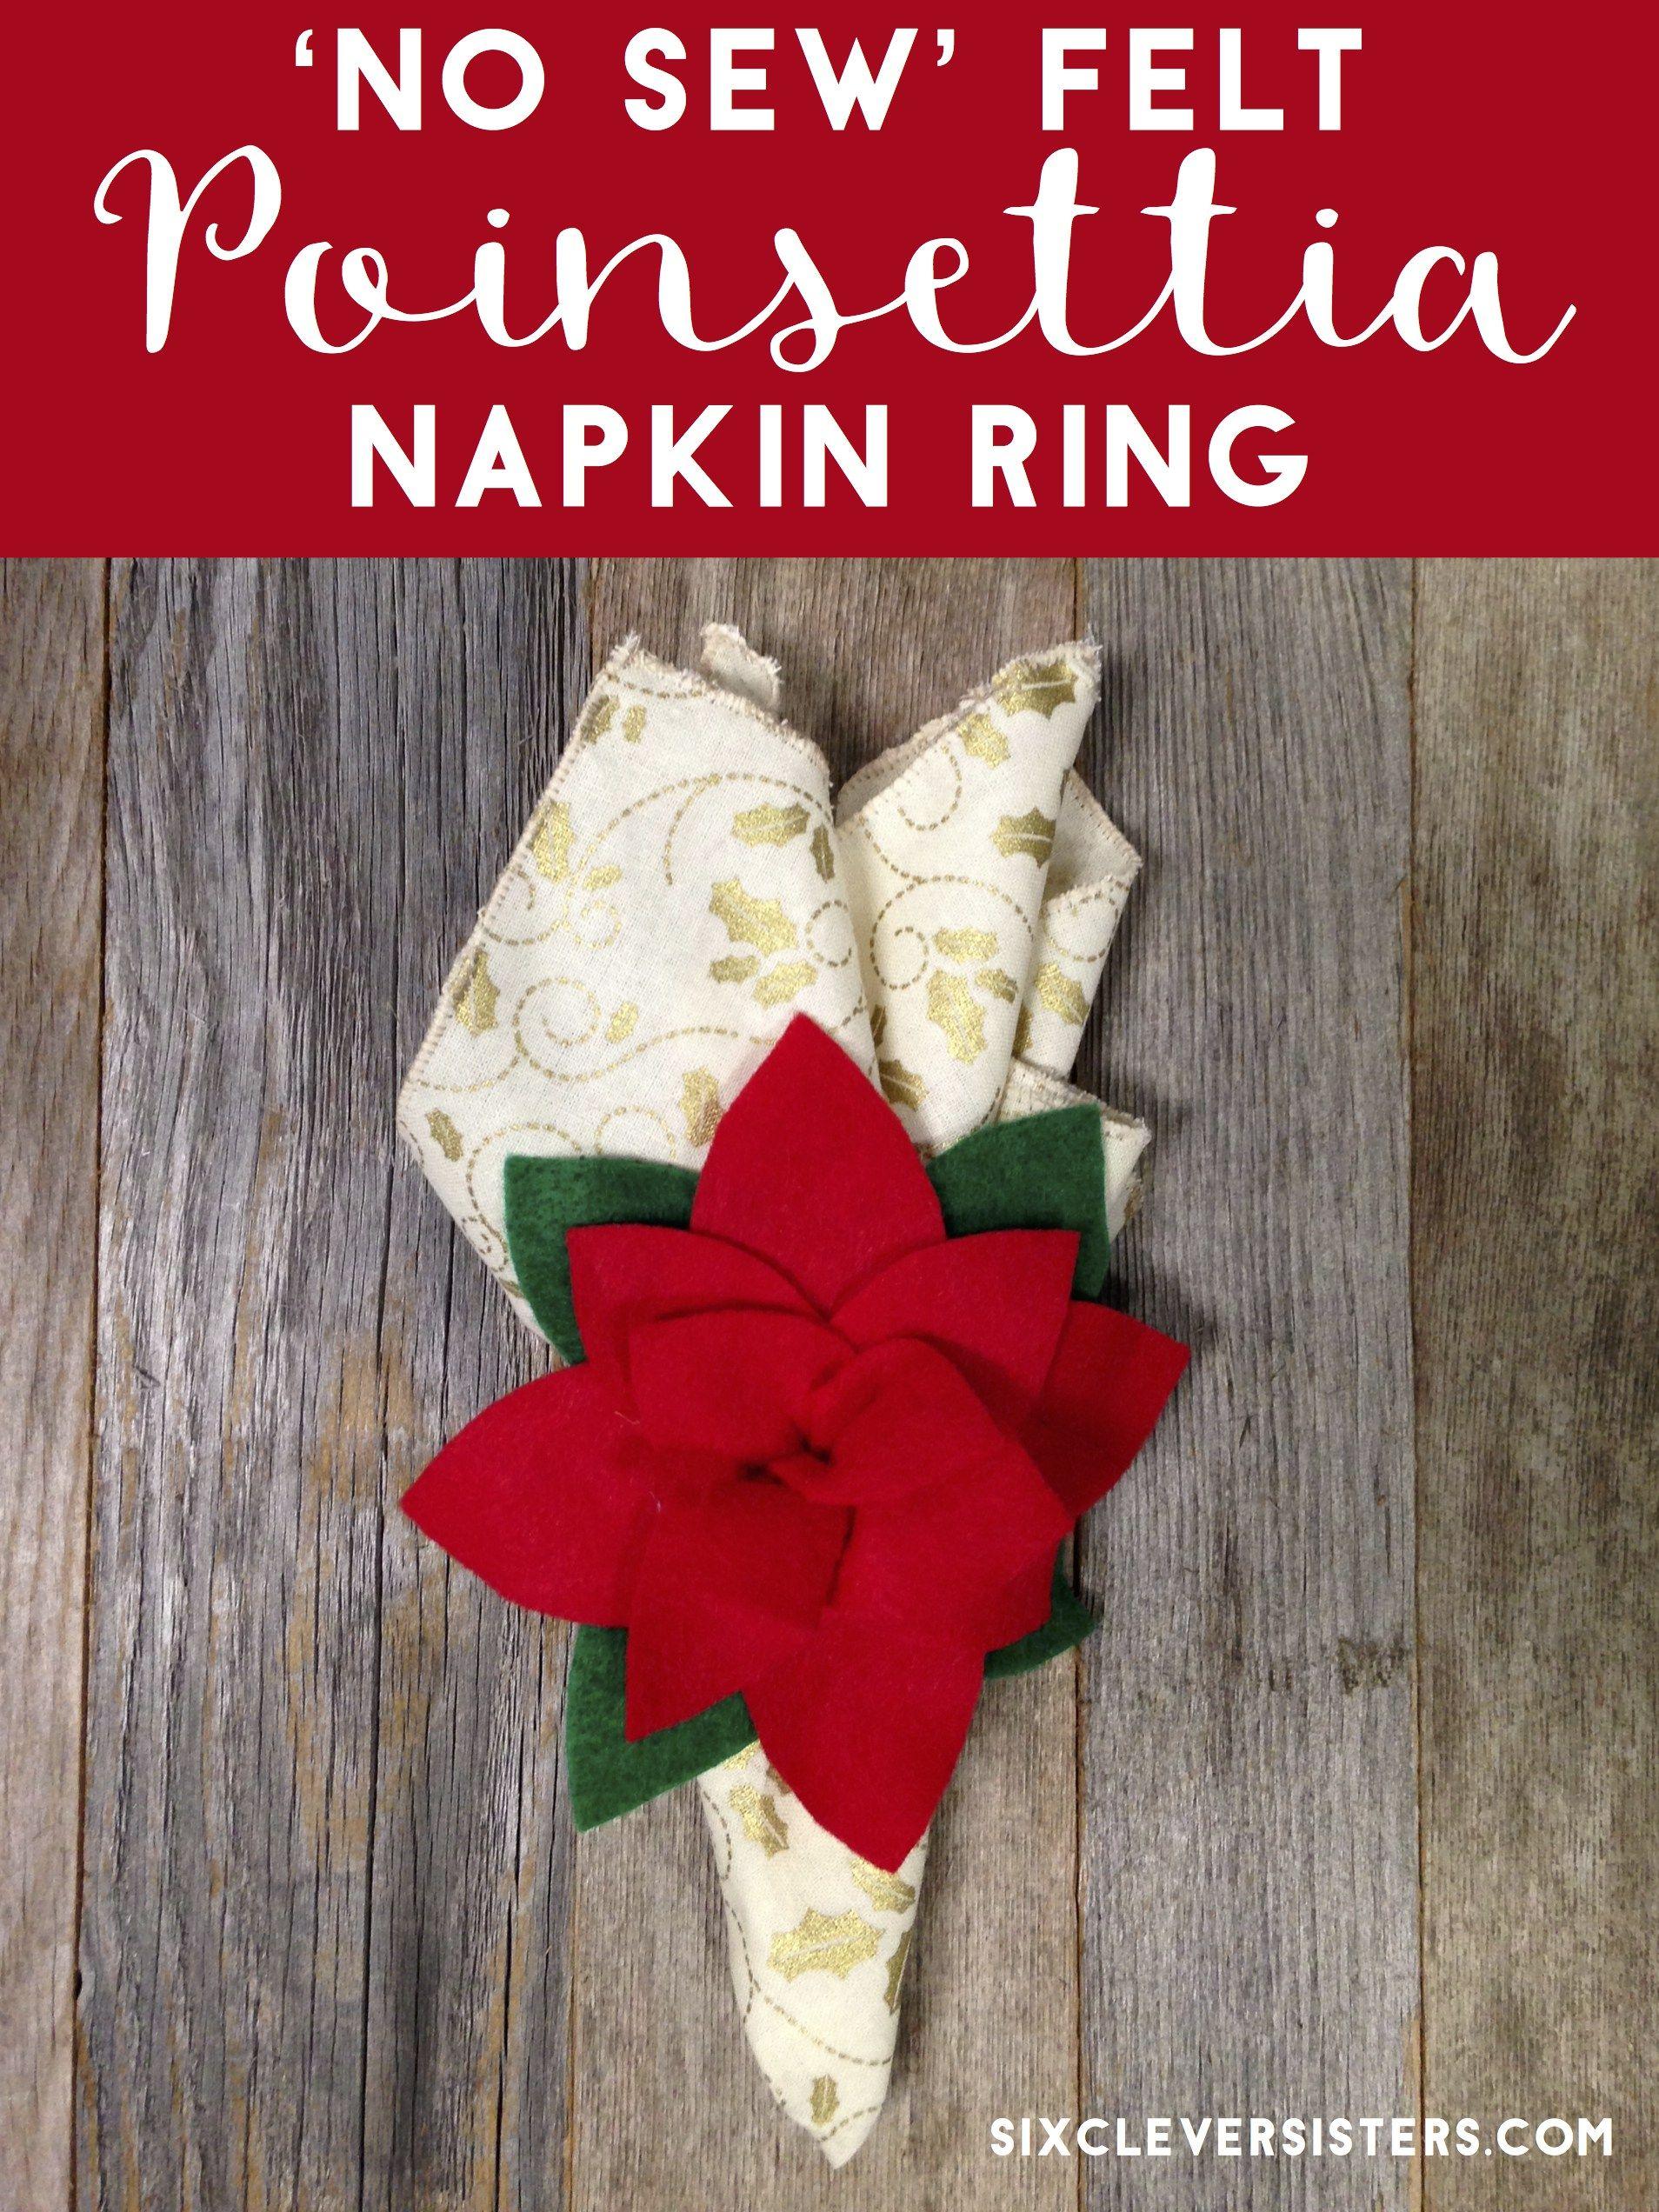 No Sew Felt Poinsettia Napkin Rings Symbols Of Christmas 2018